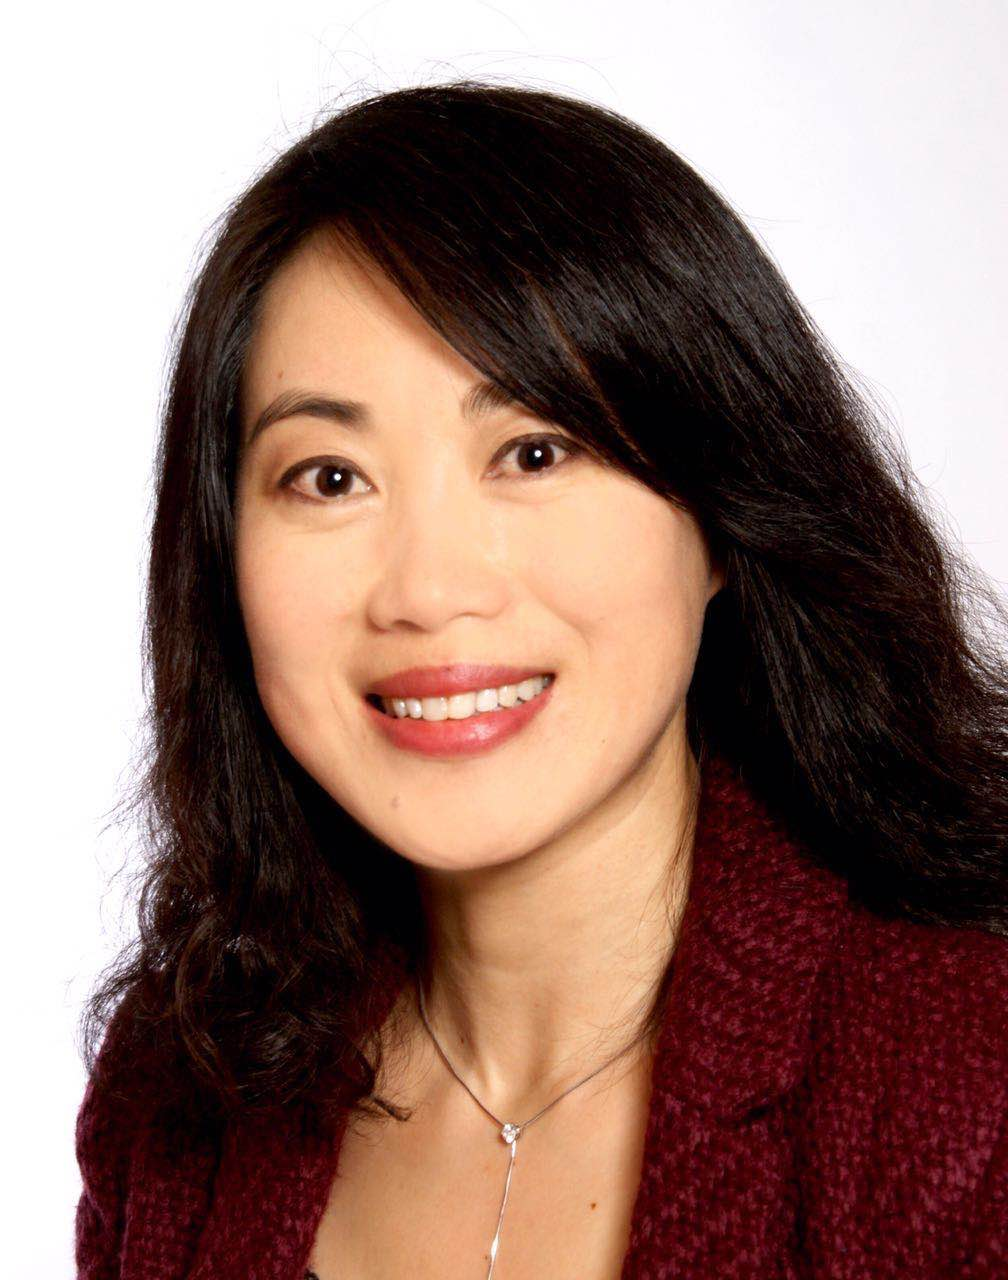 Professor Hui Chen